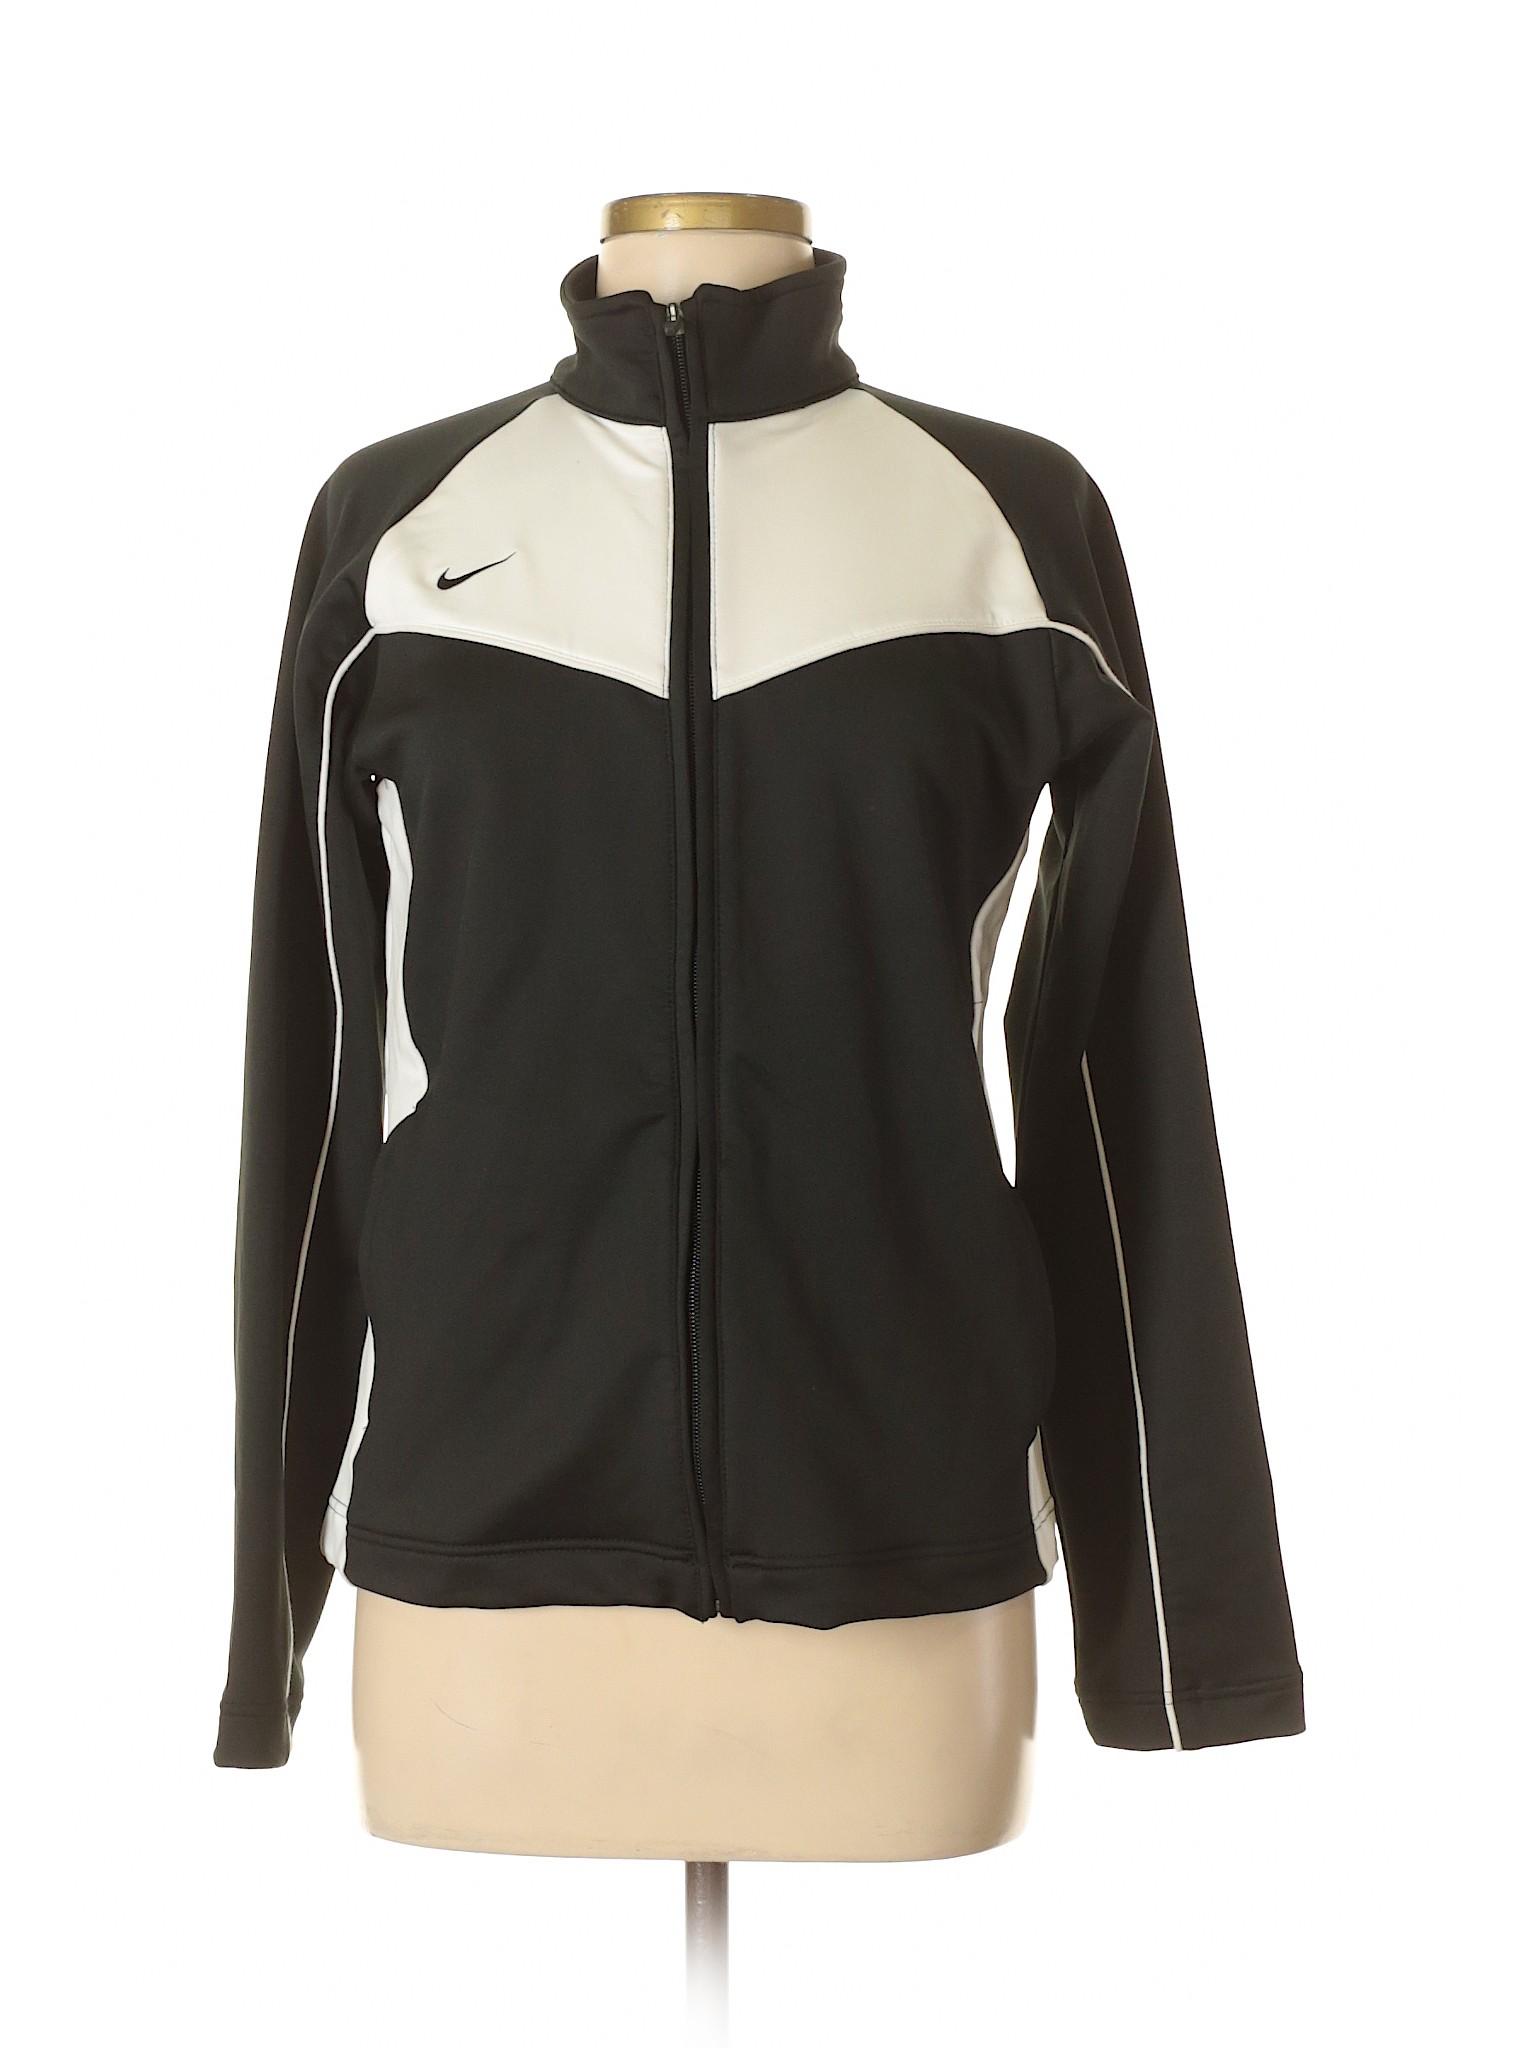 winter Leisure Leisure Leisure winter Nike Track Jacket Nike Jacket Nike Track winter Nike Track Jacket winter Leisure 01xwYn7